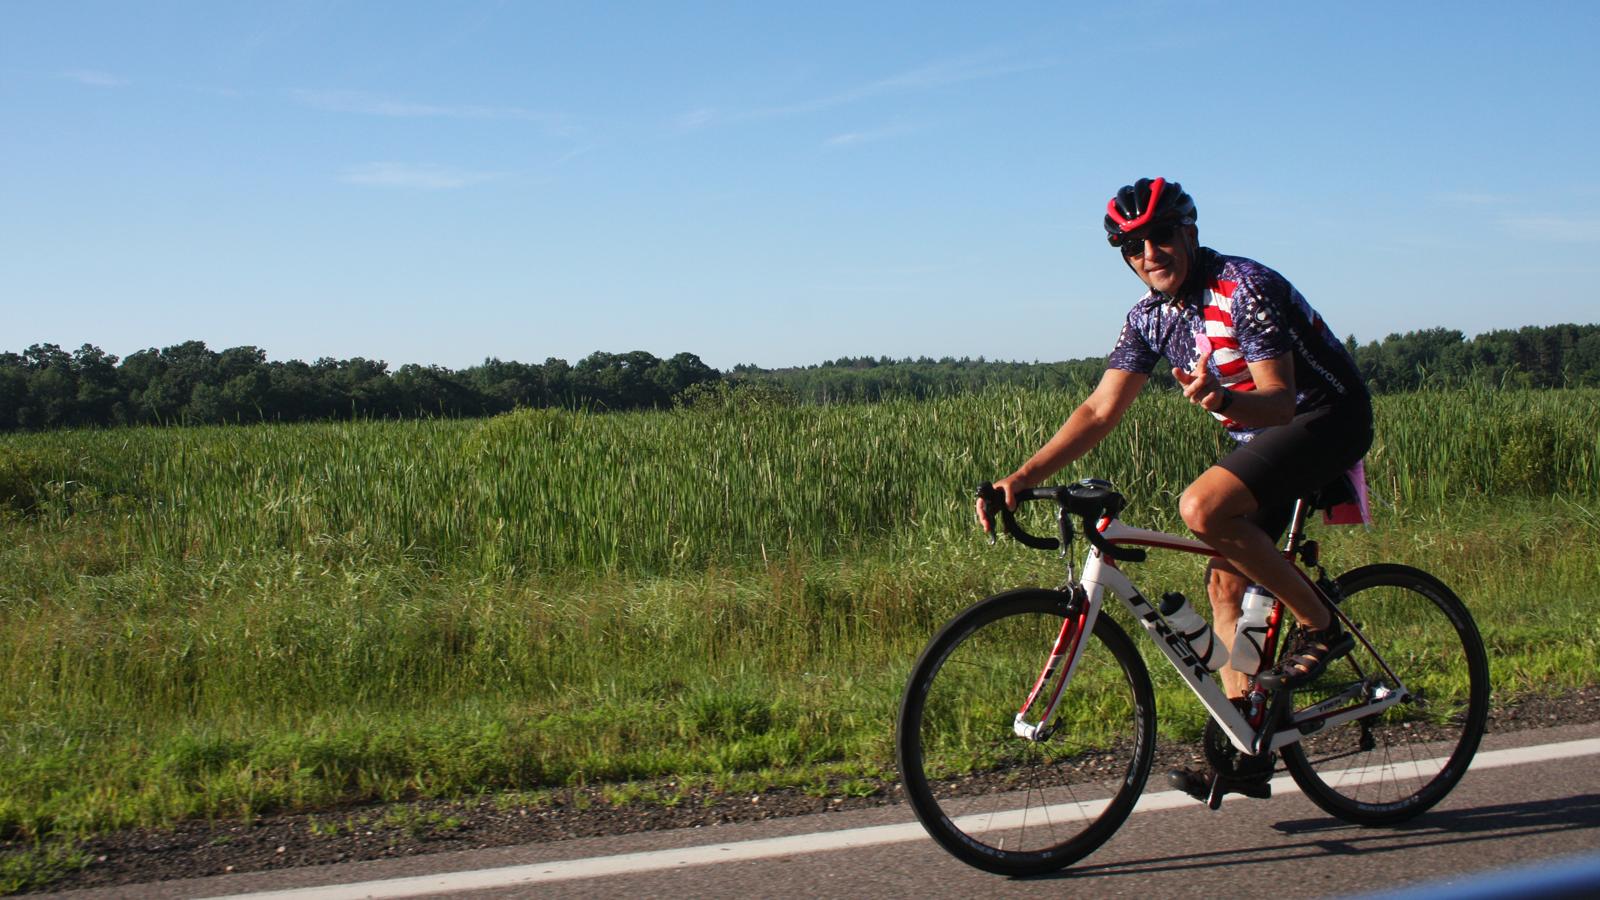 steve habitat 500 - riding strong!